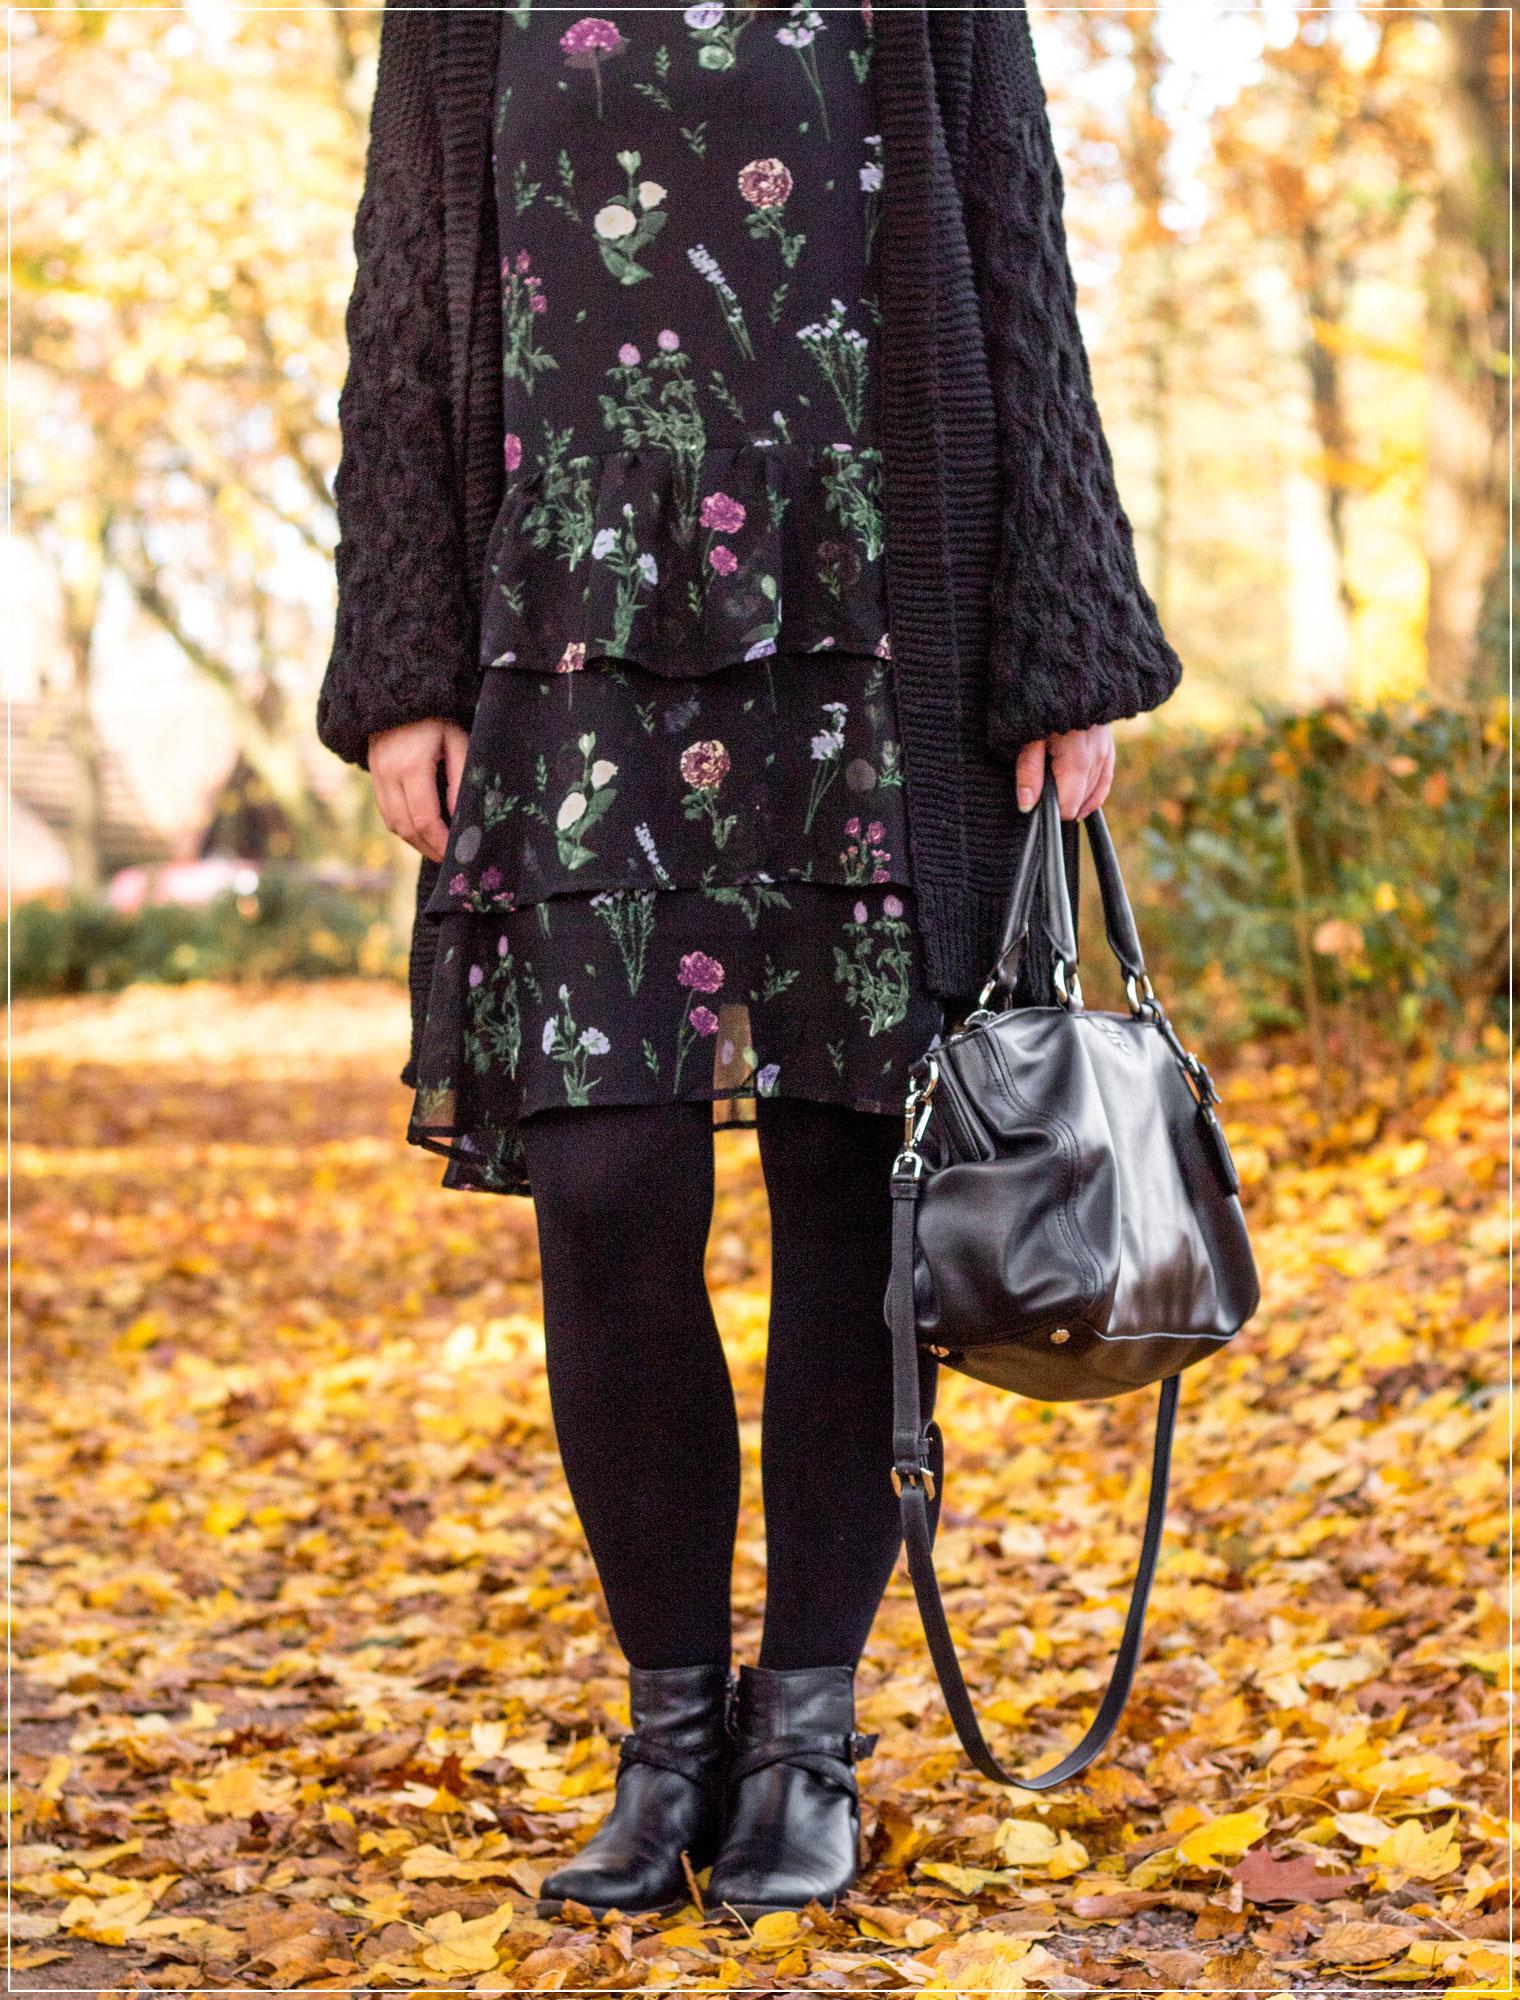 NA-KD, Dorsten, Mensing, Winteroutfit, Winterlook, kuscheliger Cardigan, Chiffon-Kleid, Outfitinspiration, Winterstyle, Alltagslook, Modebloggerin, Fashionbloggerin, Modeblog, Ruhrgebiet